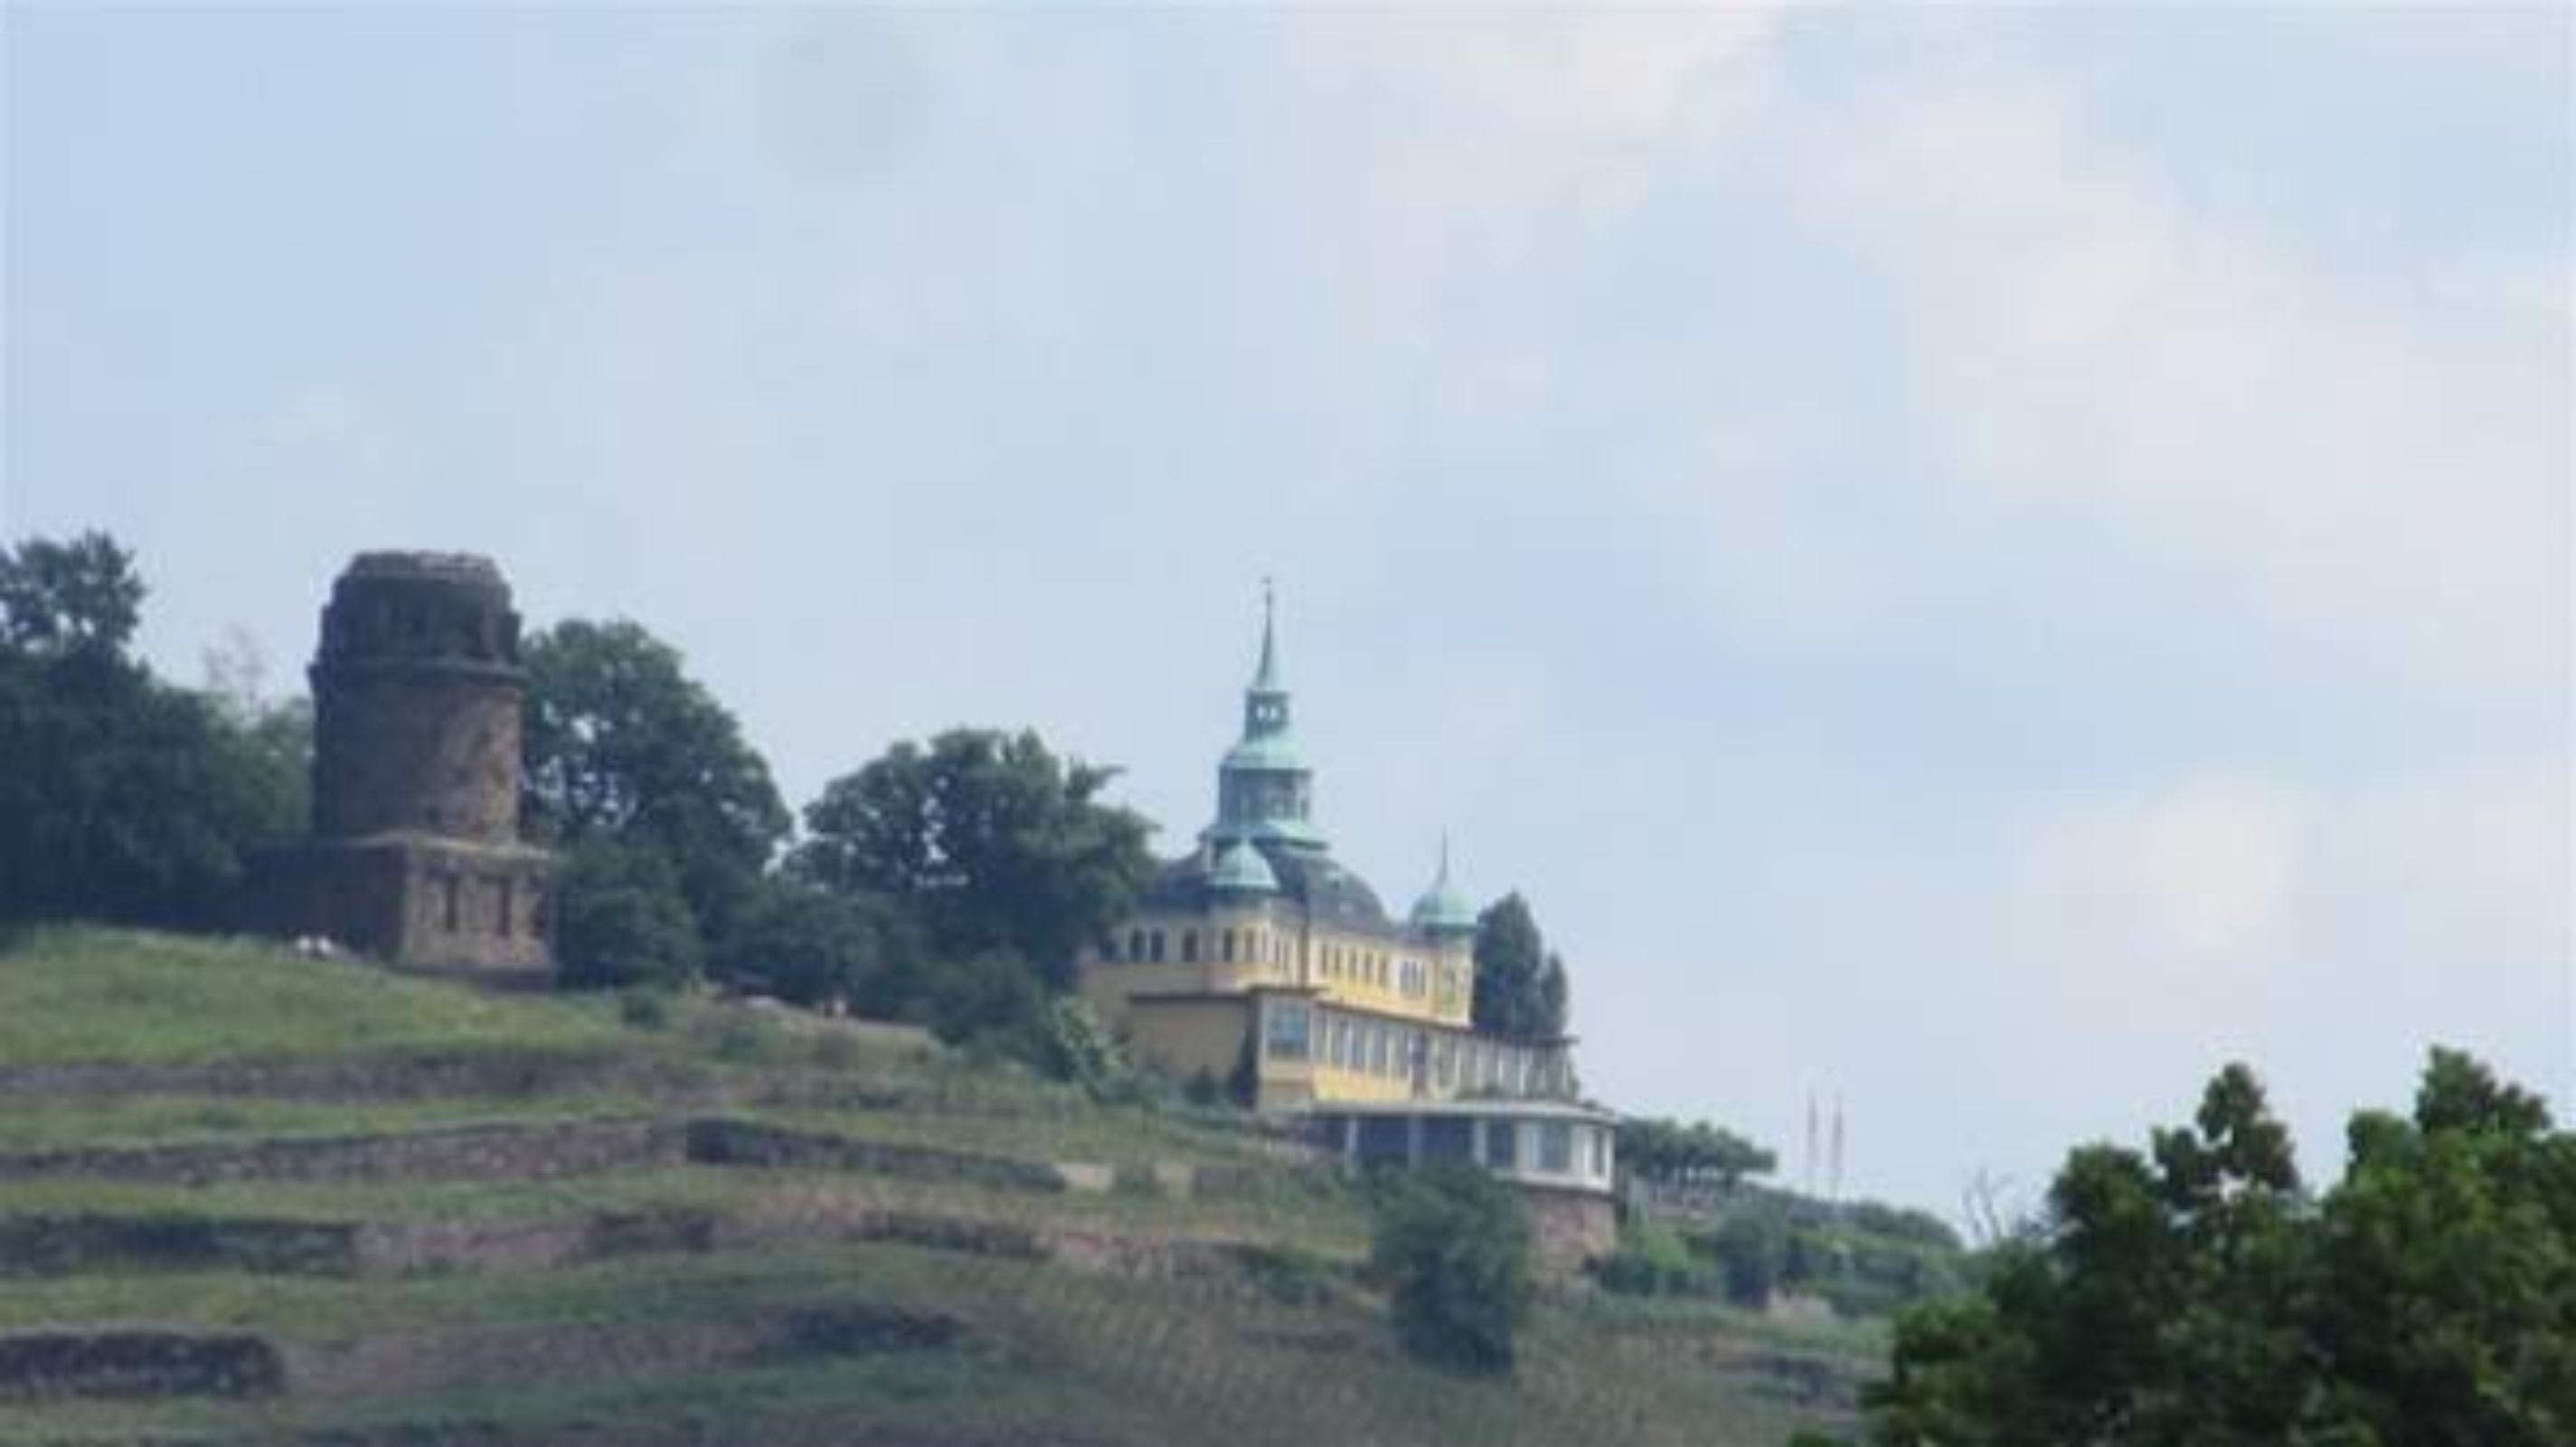 Pension Villa Marie, Meißen